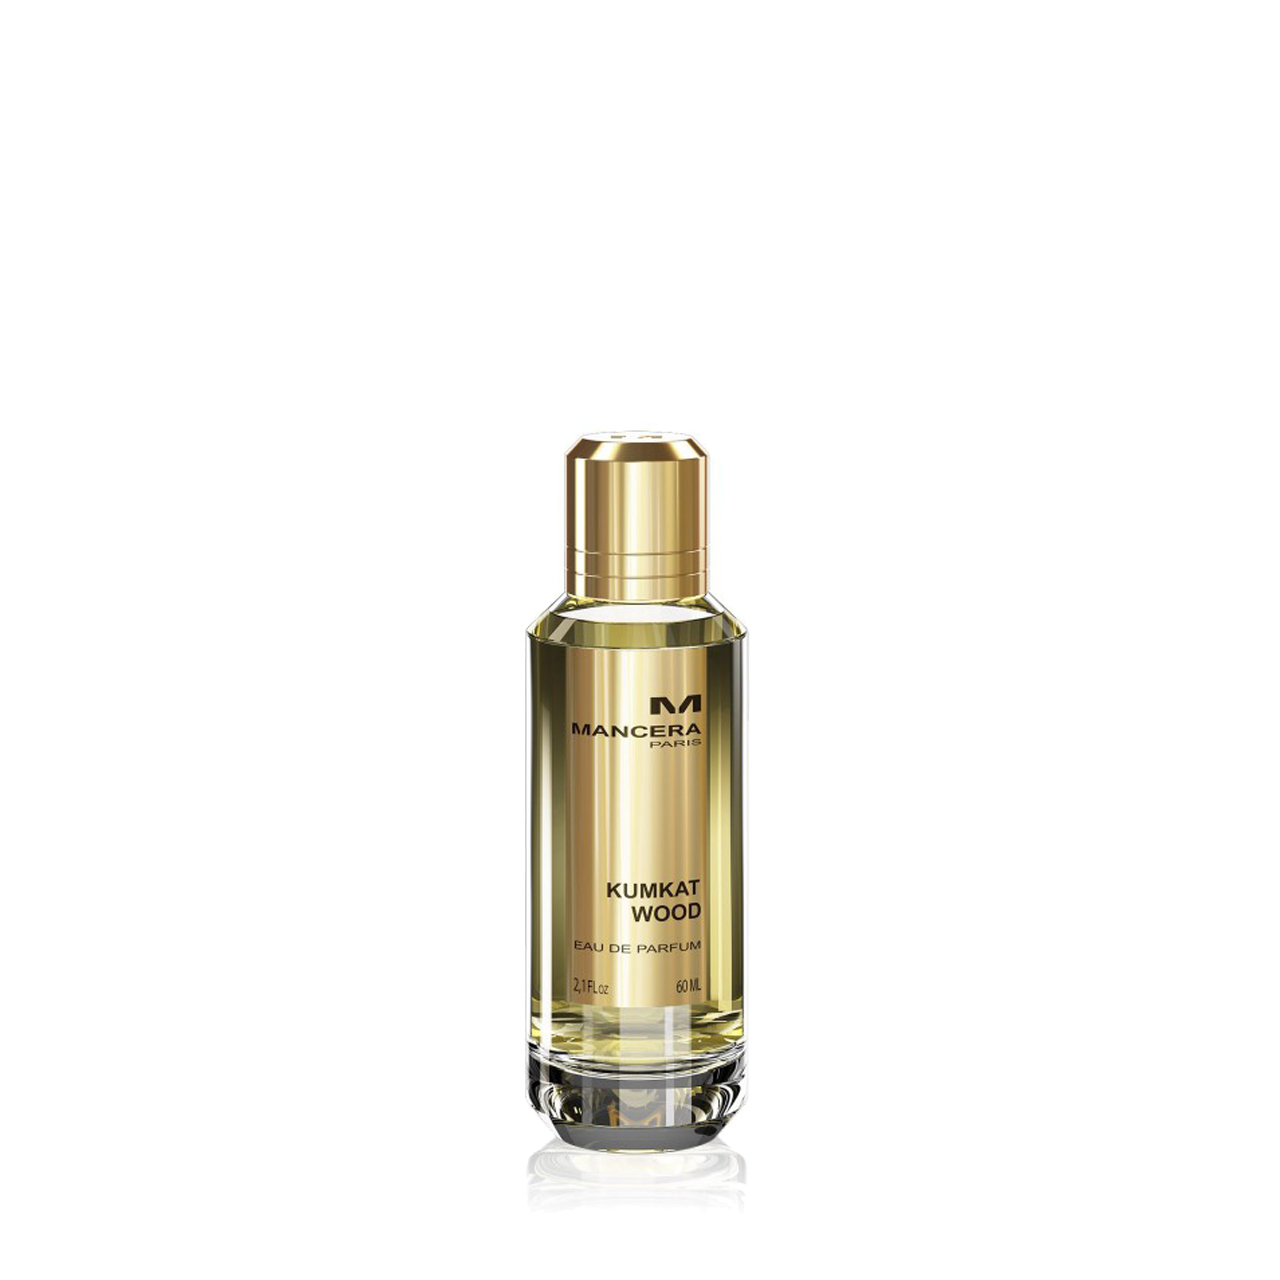 Kumkat Wood - Eau de Parfum